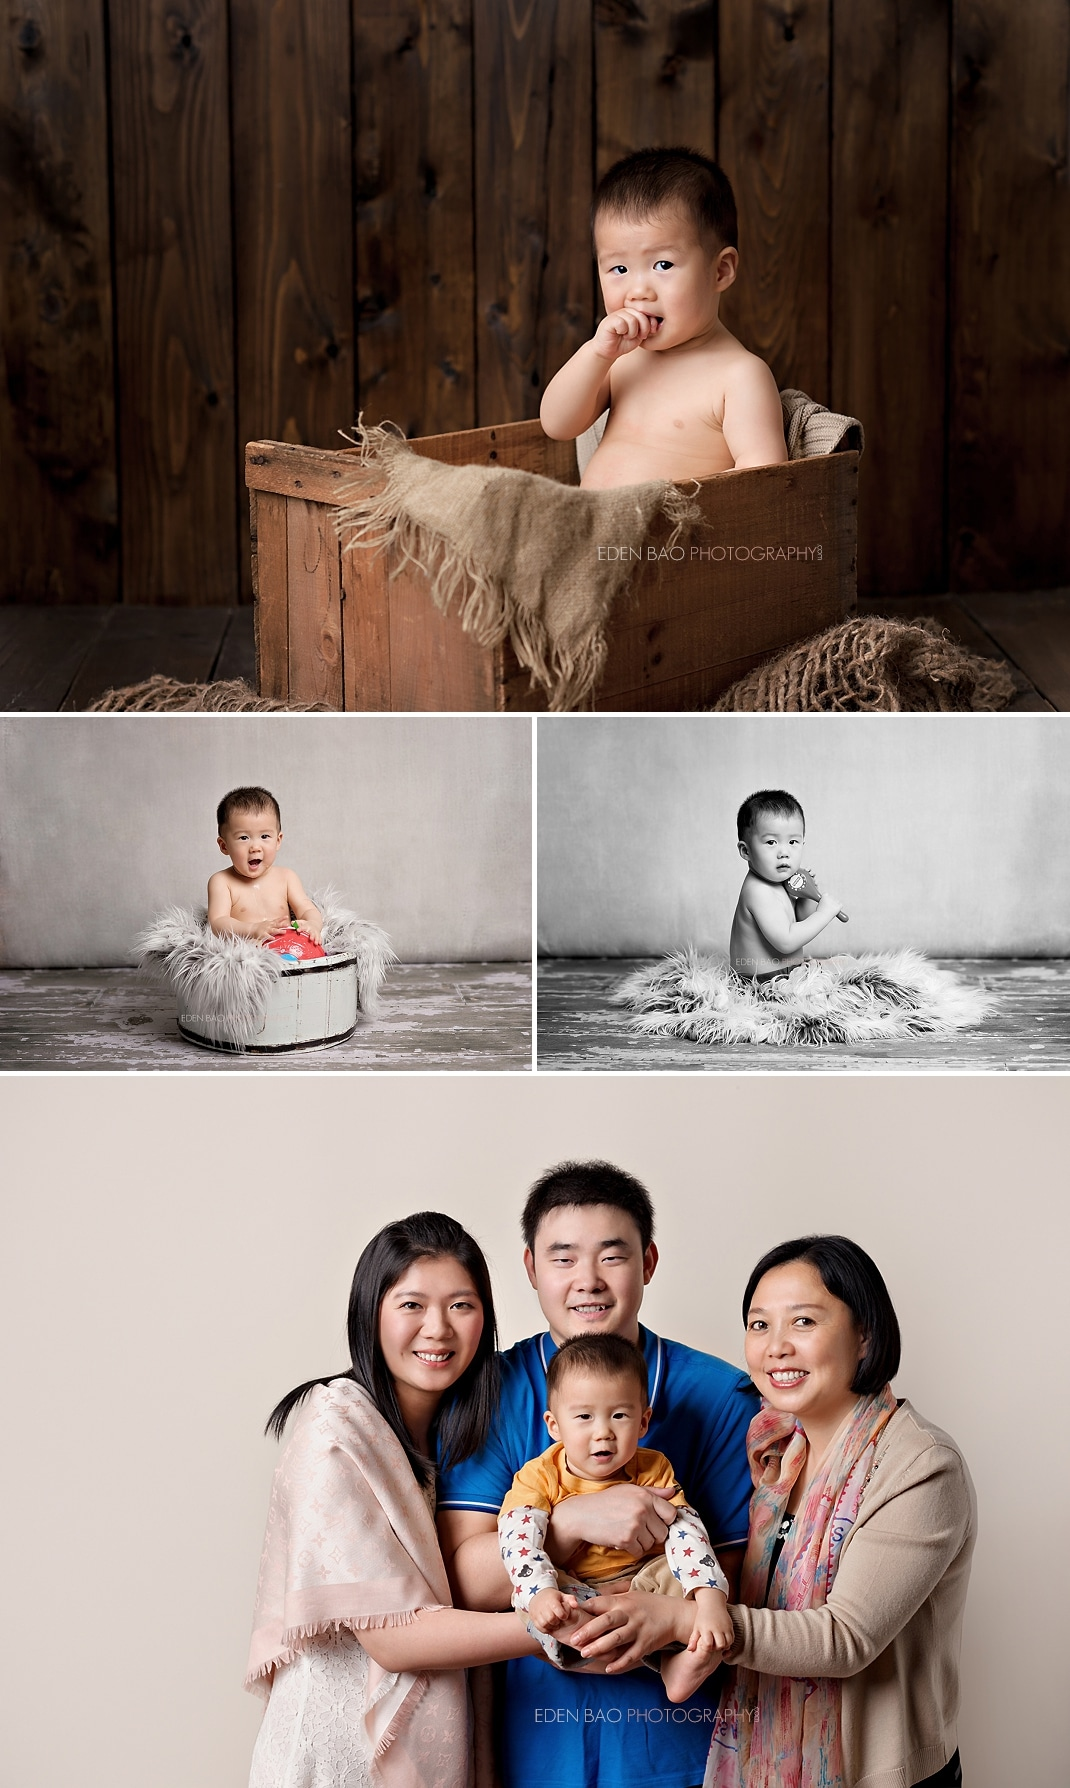 Baby Photographer Seattle wood background